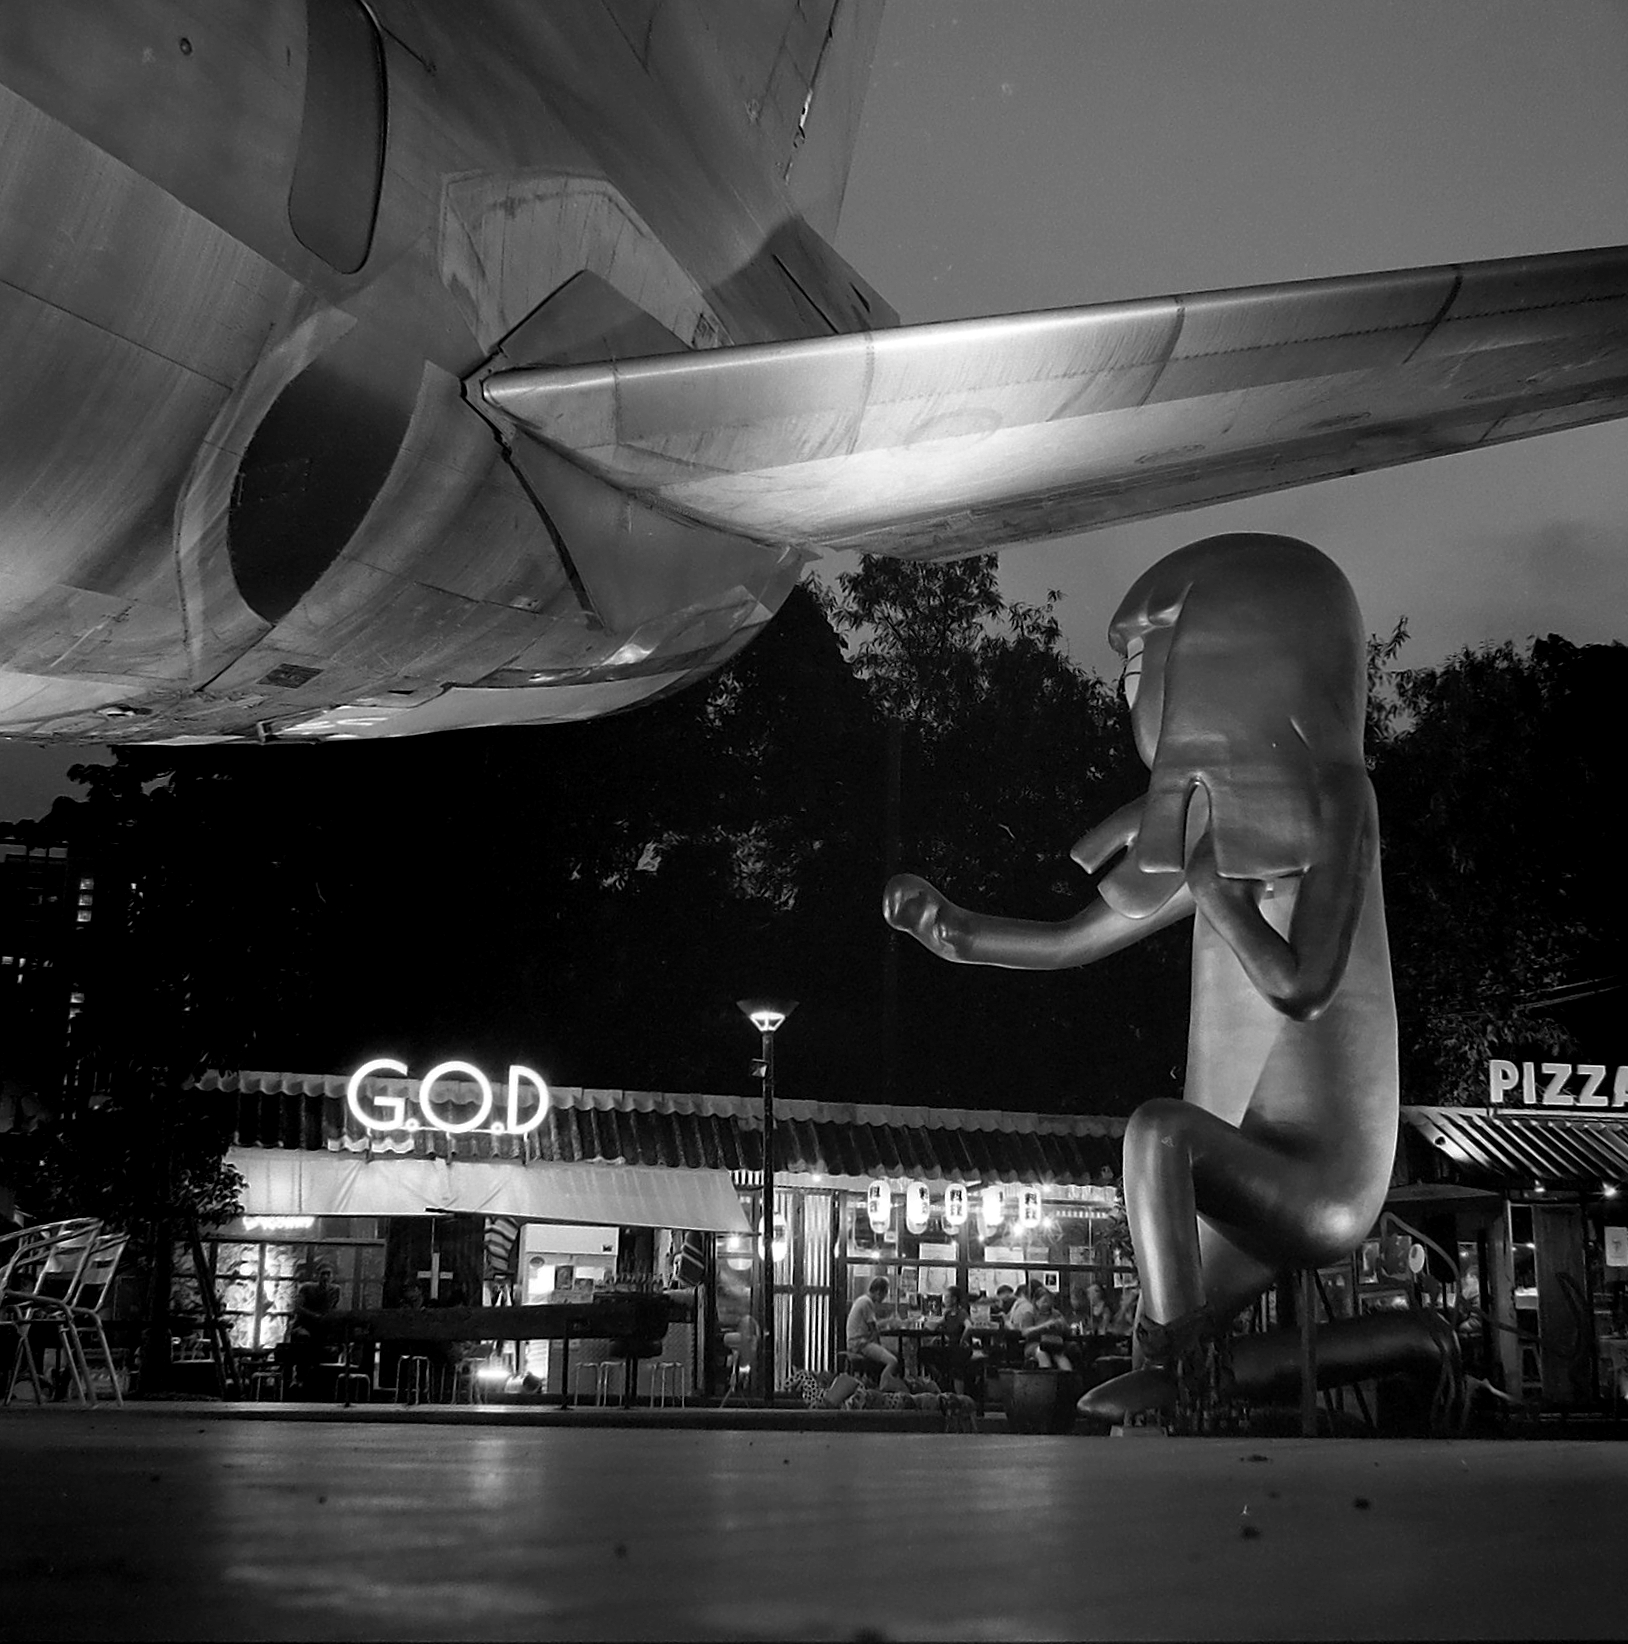 Chromacomaphoto Bangkok Street Photography Delta 400 Rolleiflex Thailand  planar xenotar 2 8 e 3 5 f  (3).JPG